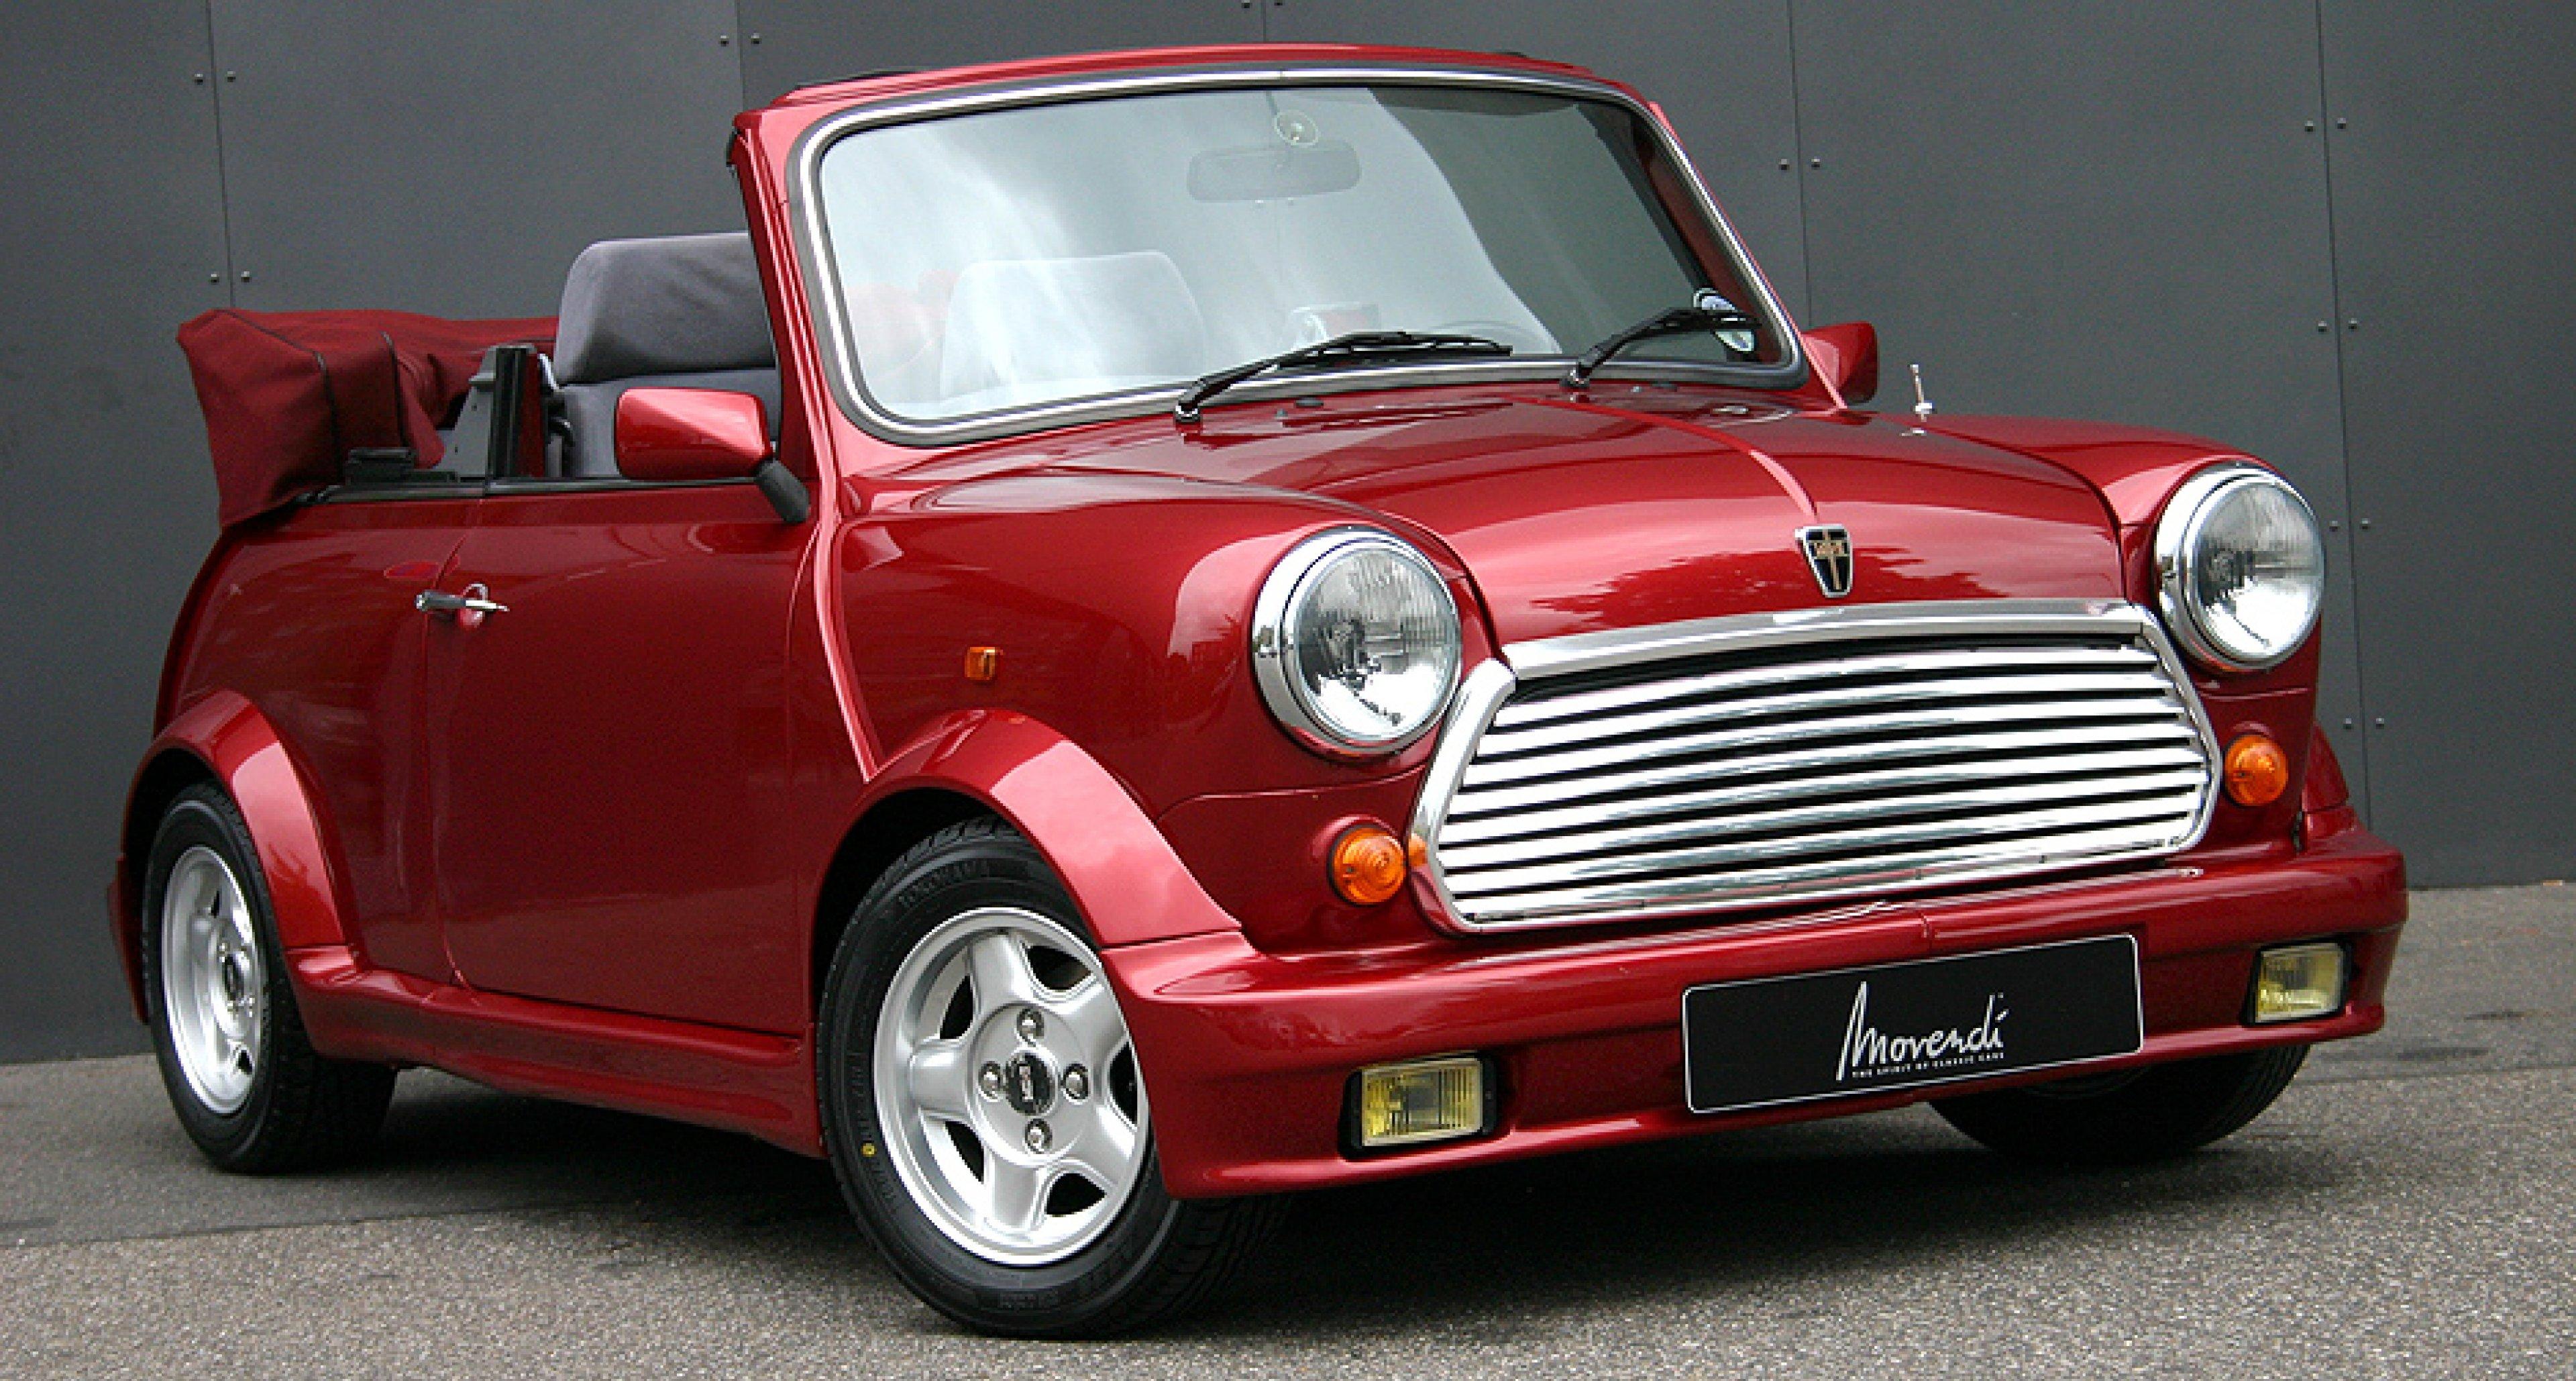 mini classic cabrio little red rover 39 s hood classic. Black Bedroom Furniture Sets. Home Design Ideas